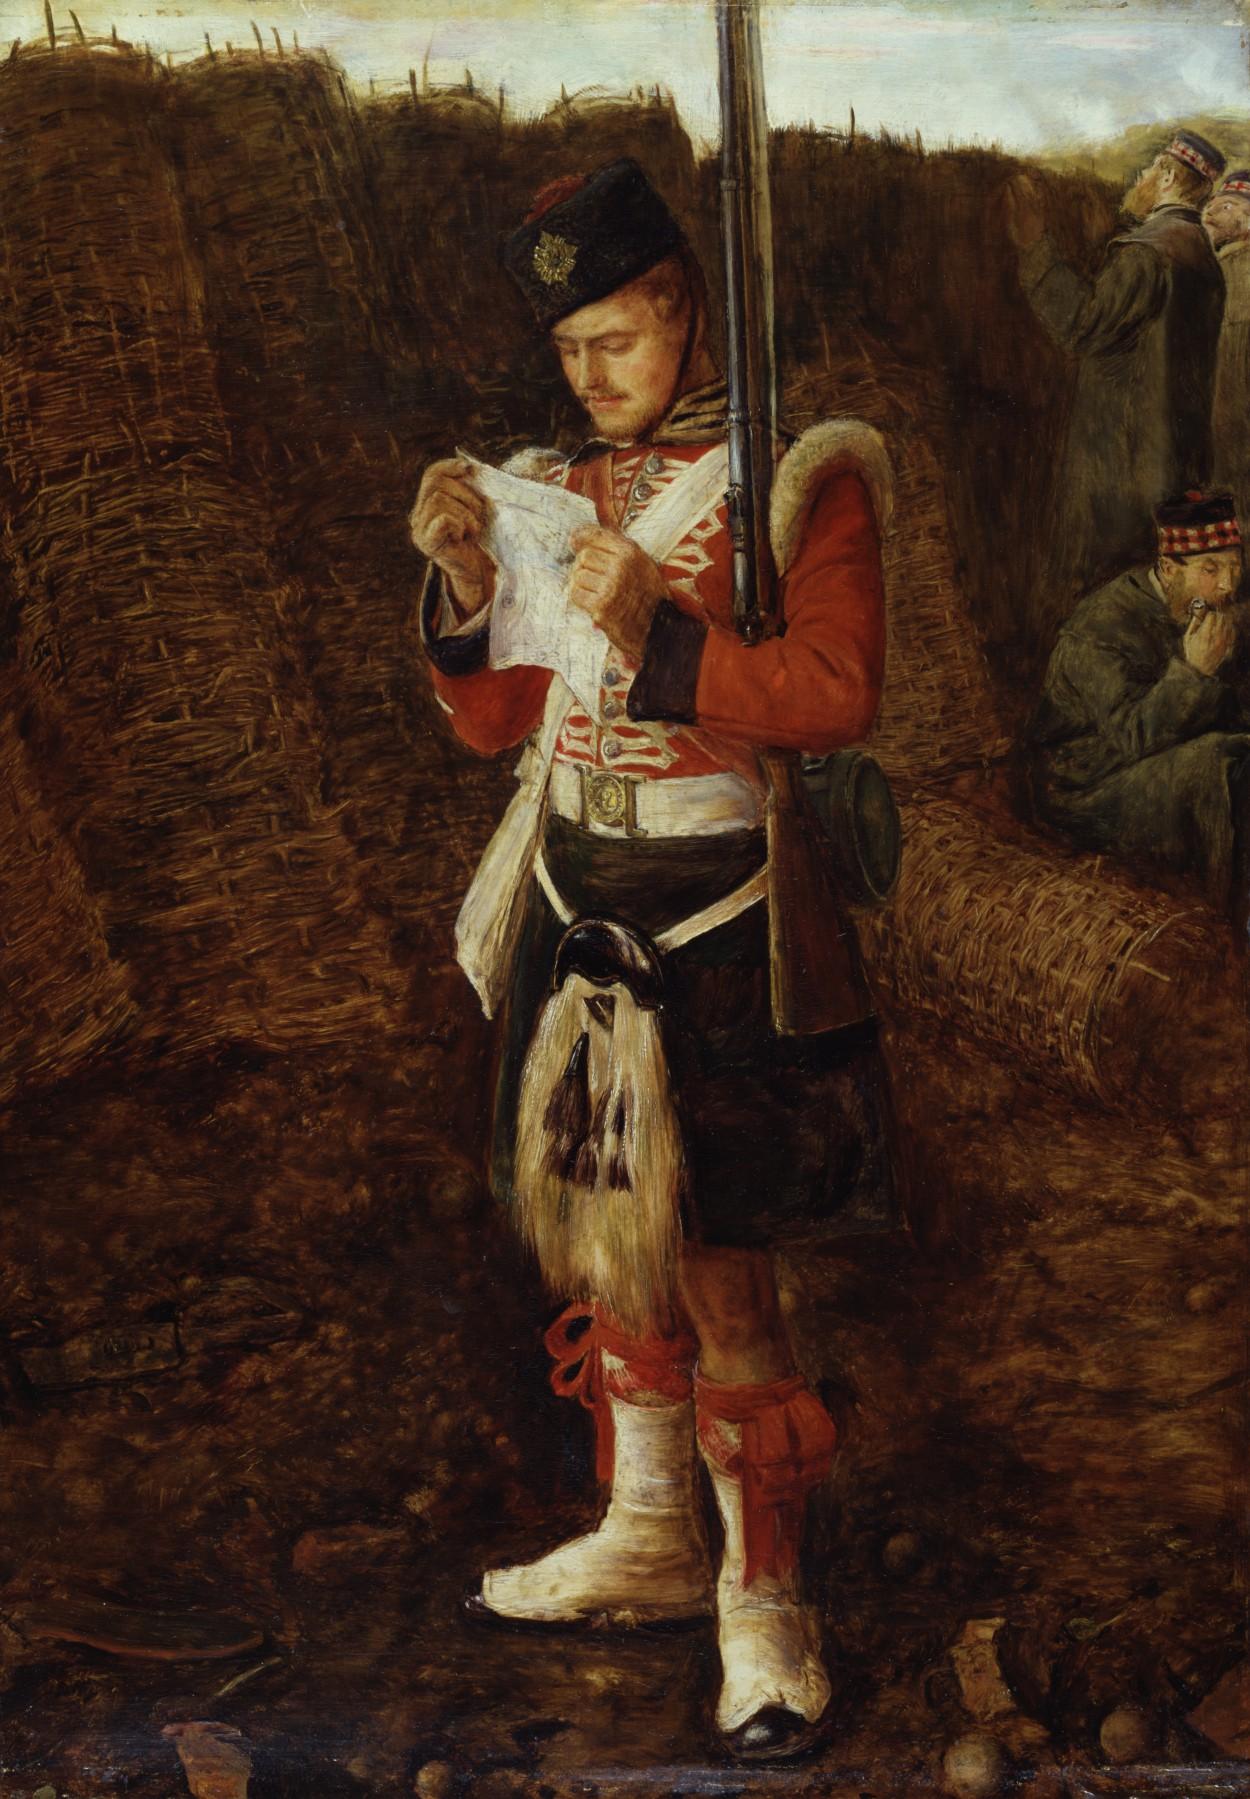 Letter From Home' by the artist John Everett Millais